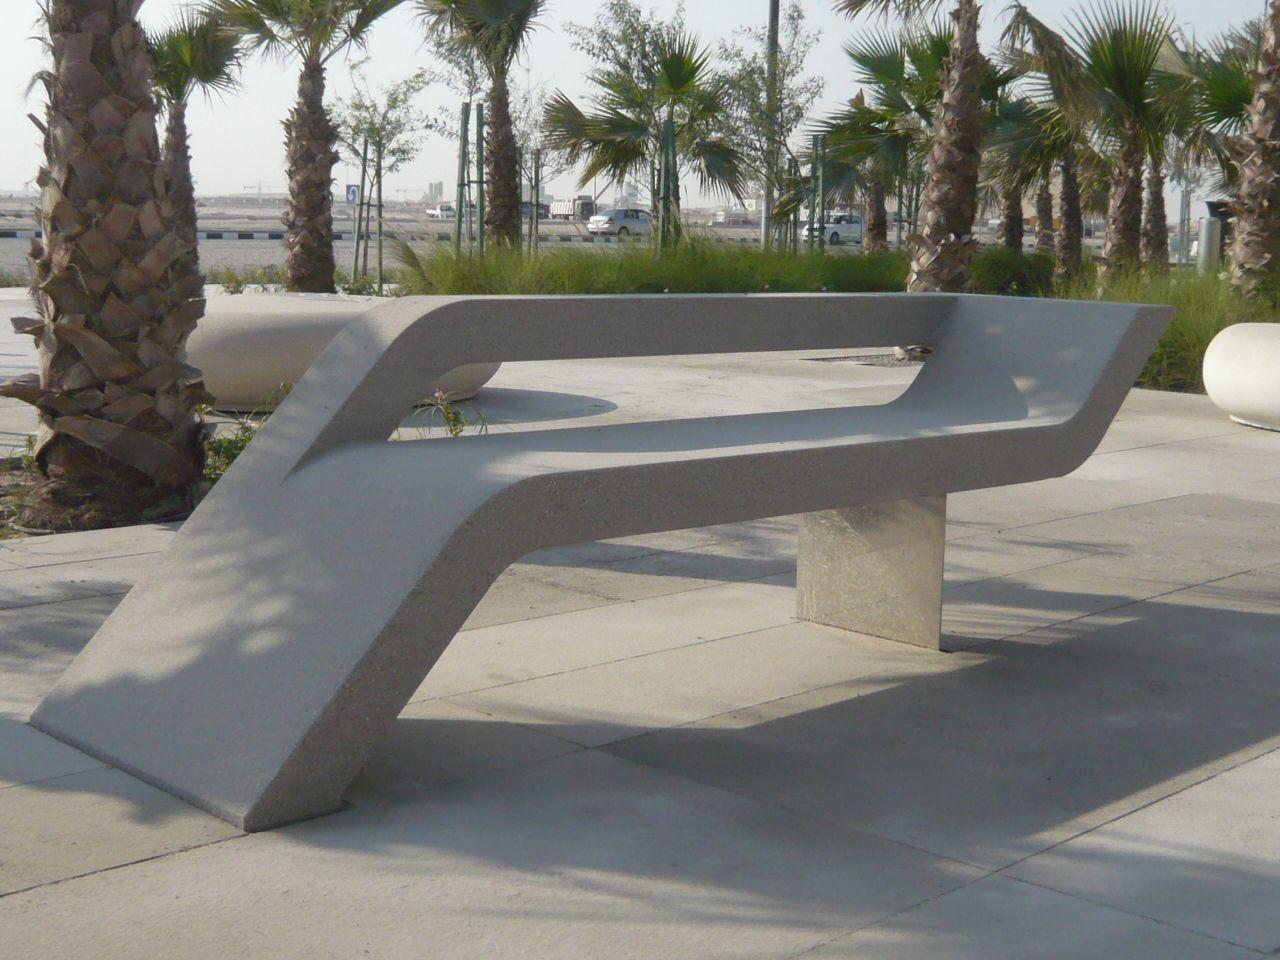 Street Furniture | STREET FURNITURE IN LUSAIL, QATAR | Dna Barcelona U0026  Partners